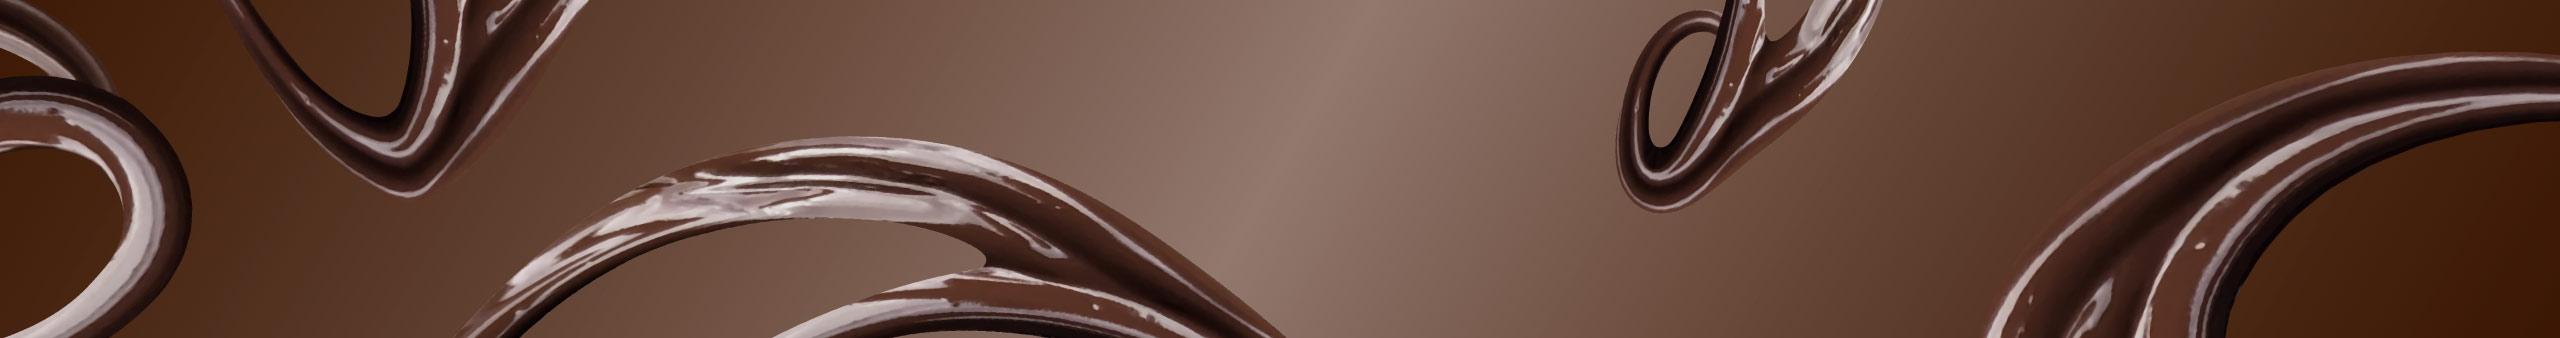 Chocolate-BG